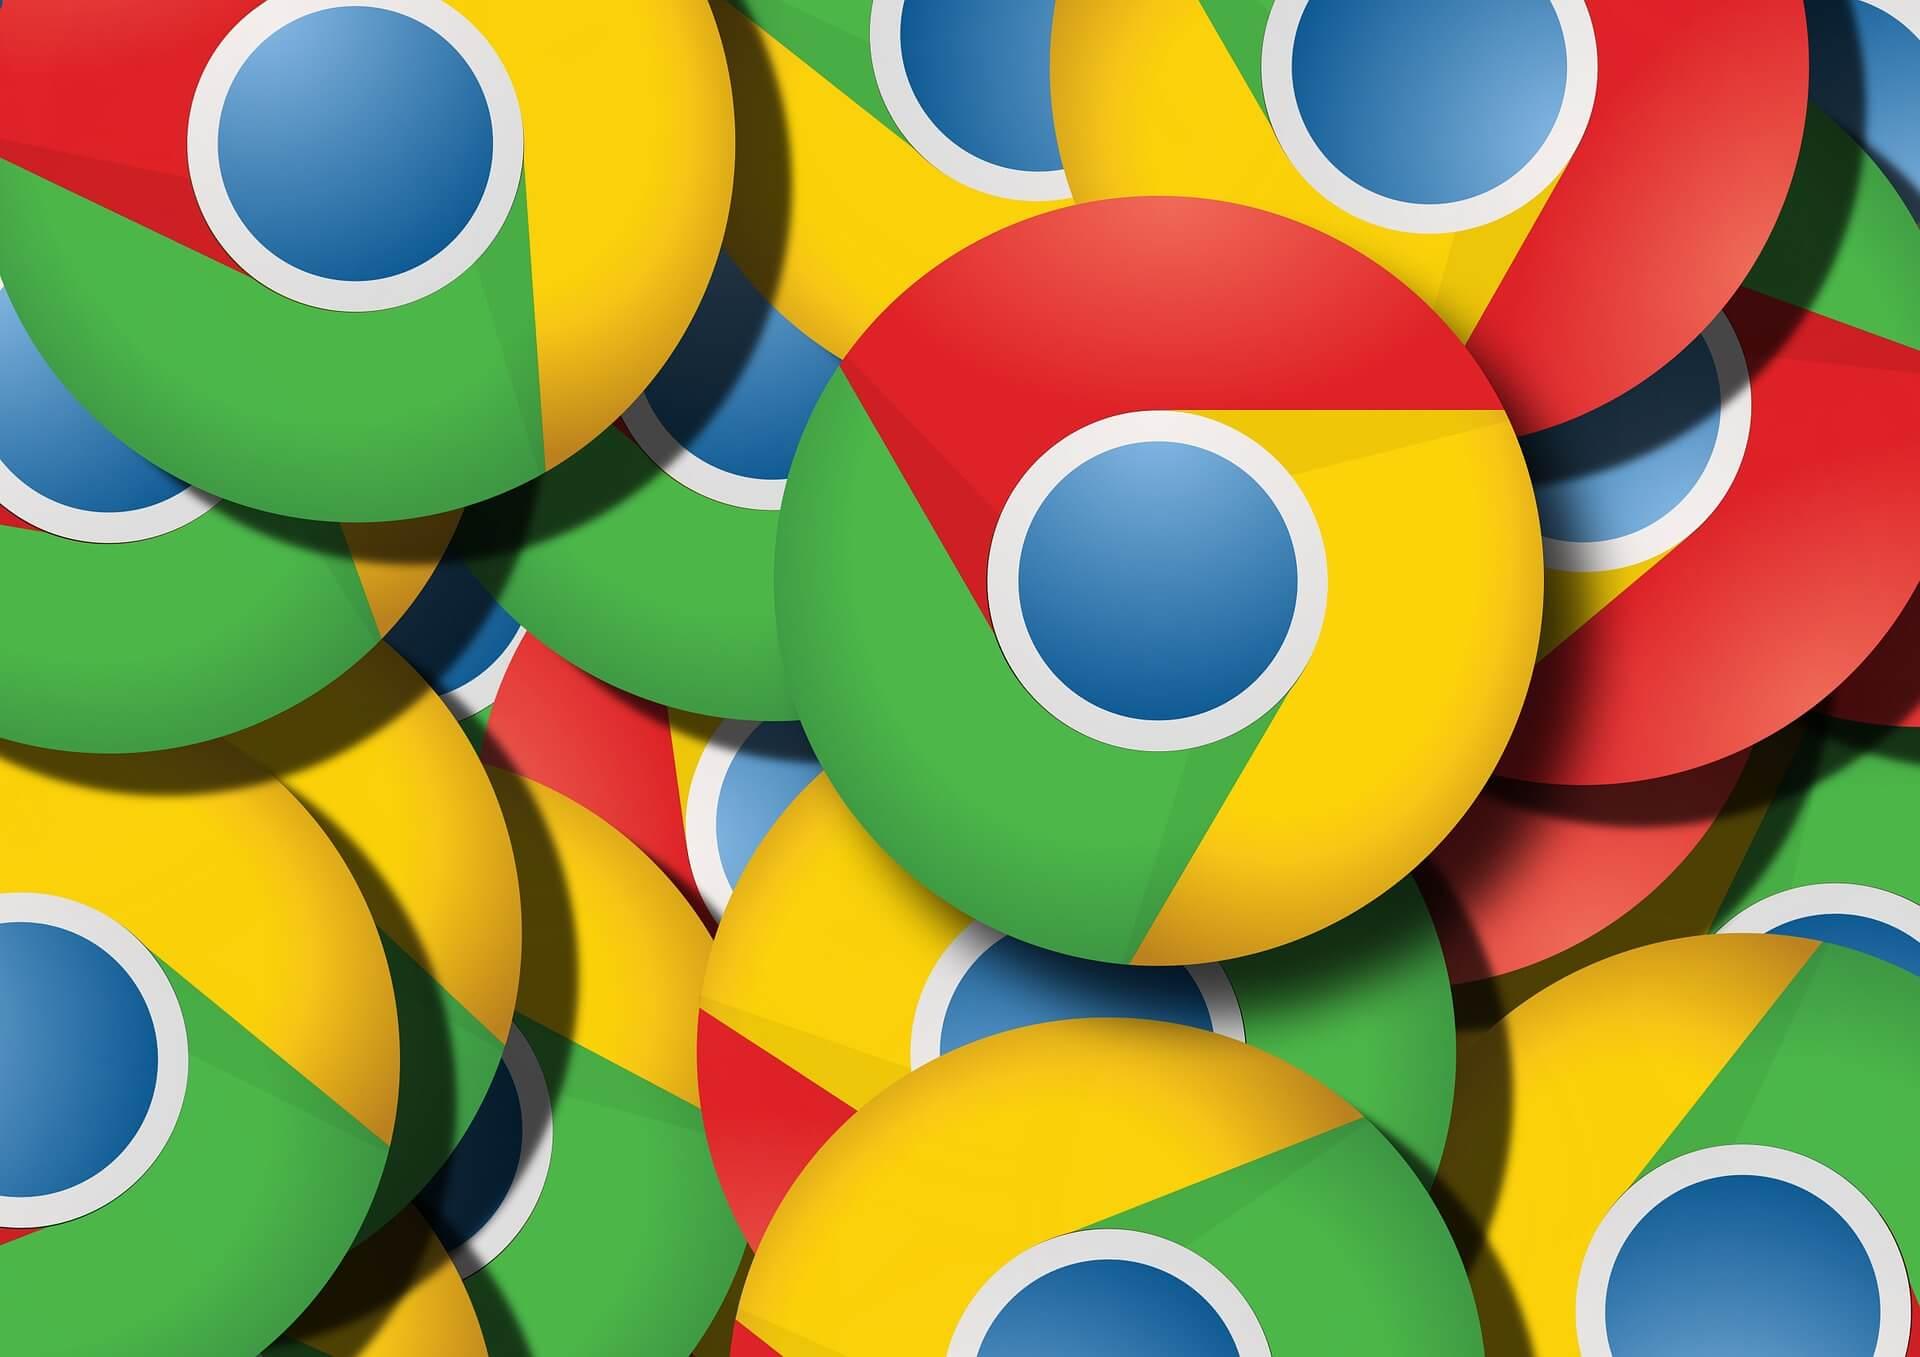 bloquear pagina web en google chrome